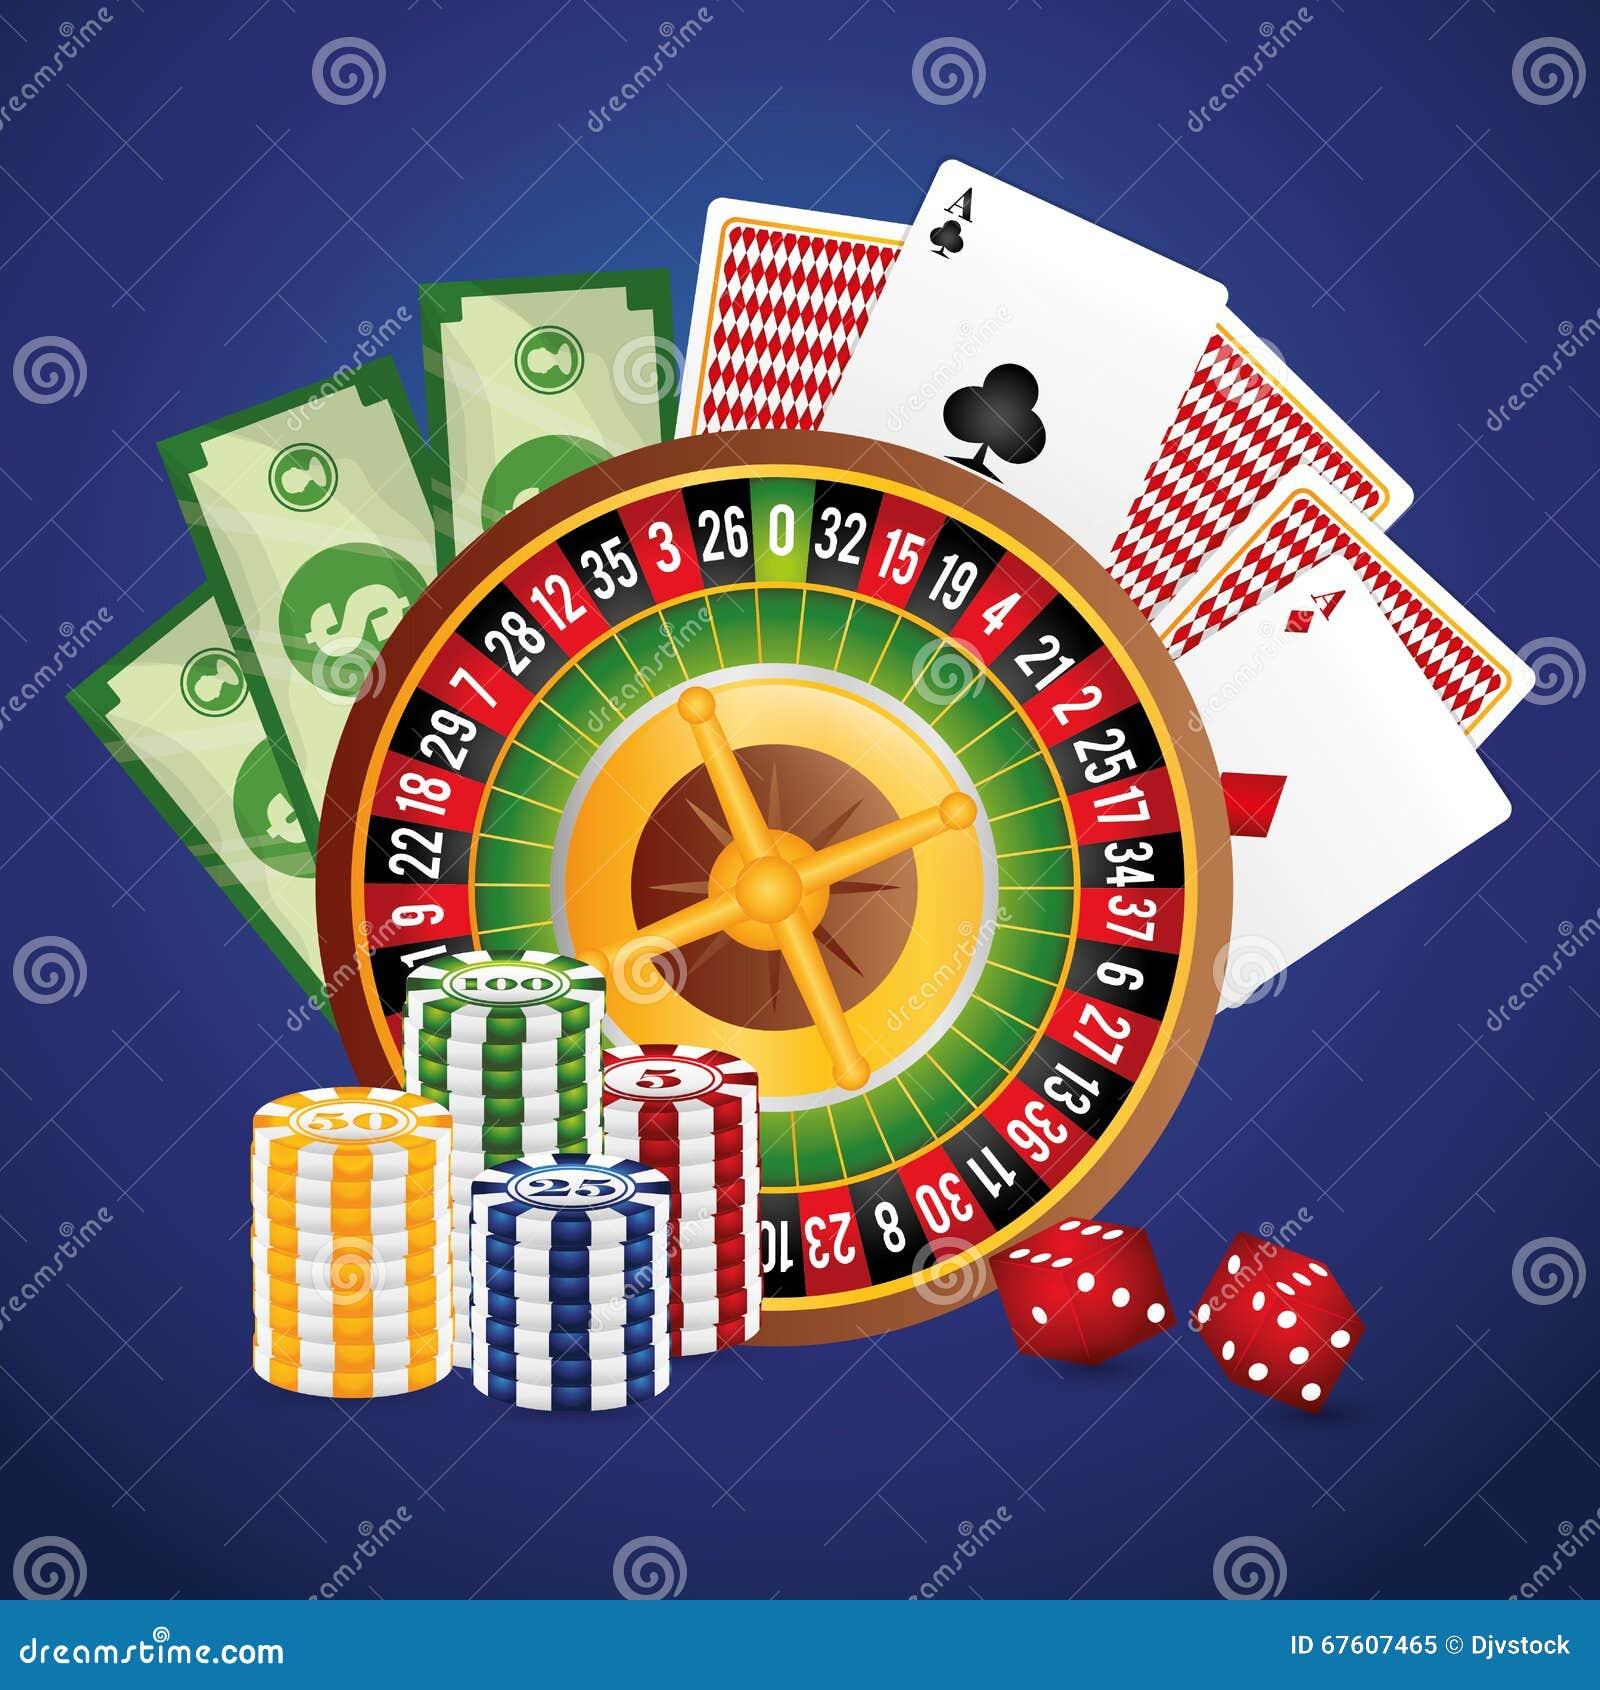 Casino icon desin stock vector image 67607465 for Architectural design concepts las vegas